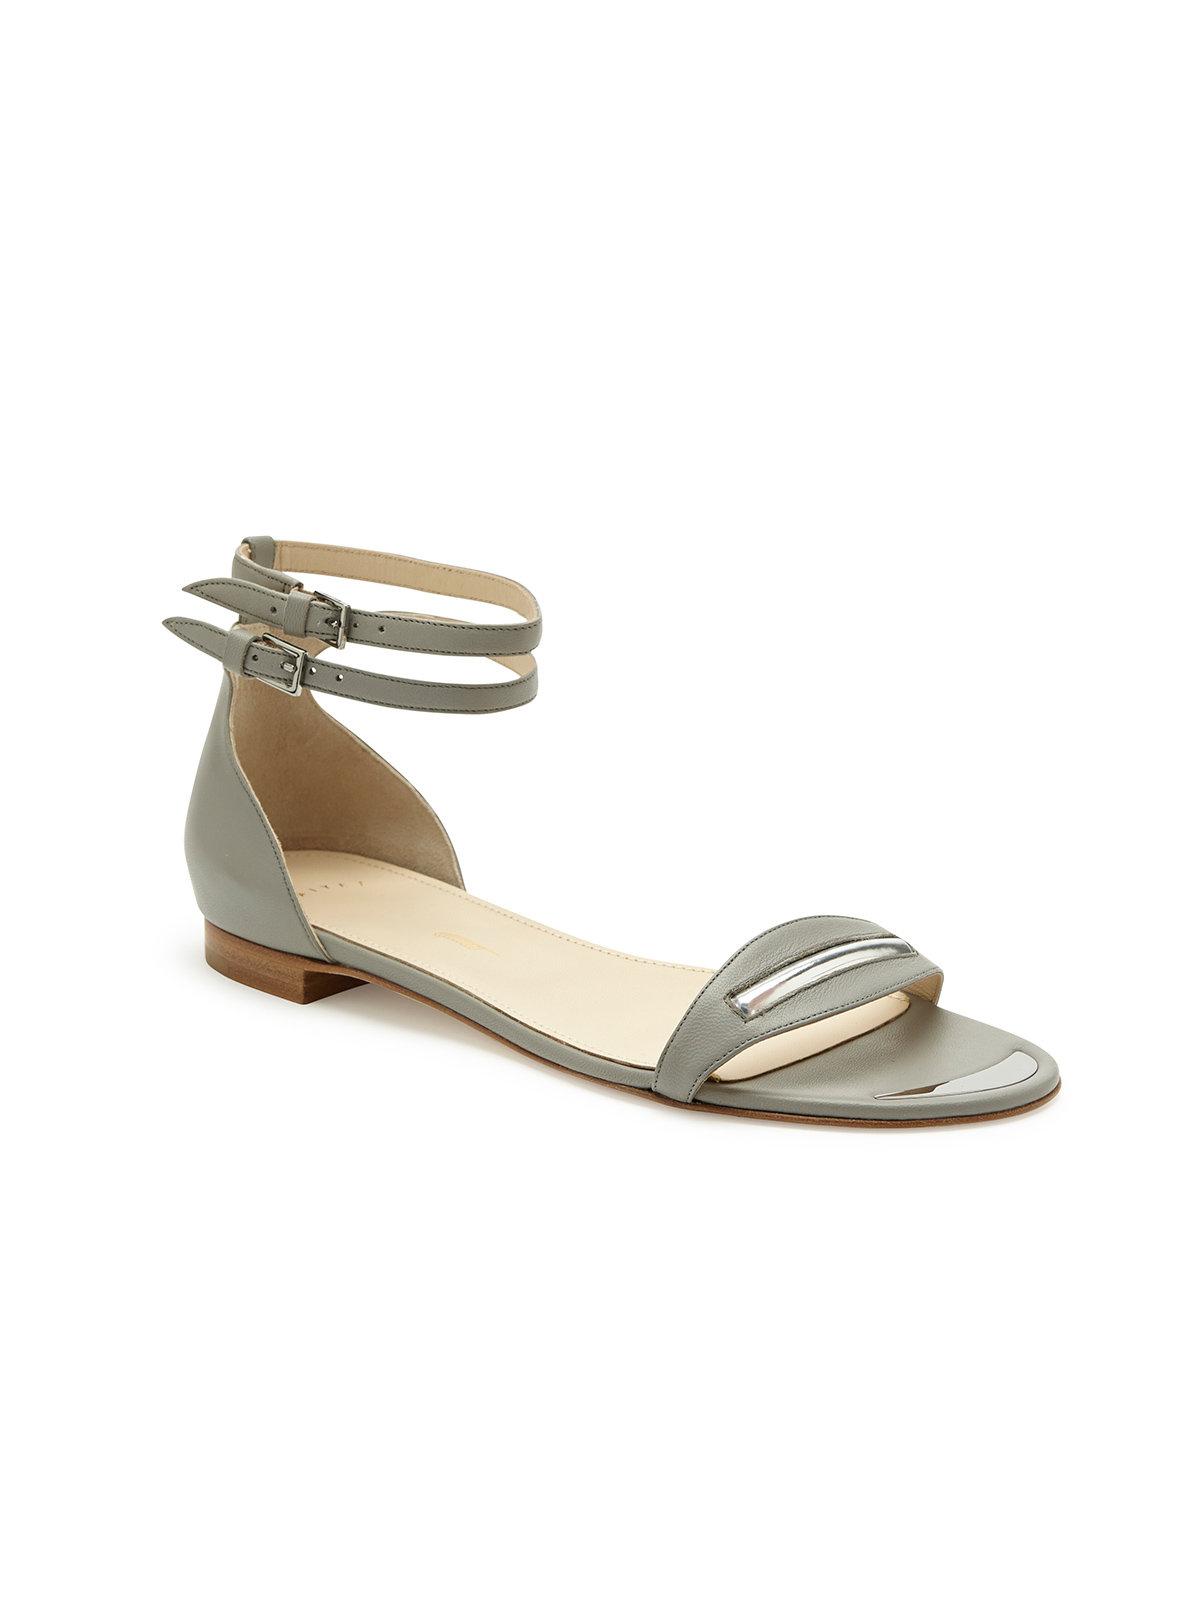 Maiyet Flat Shoes Women